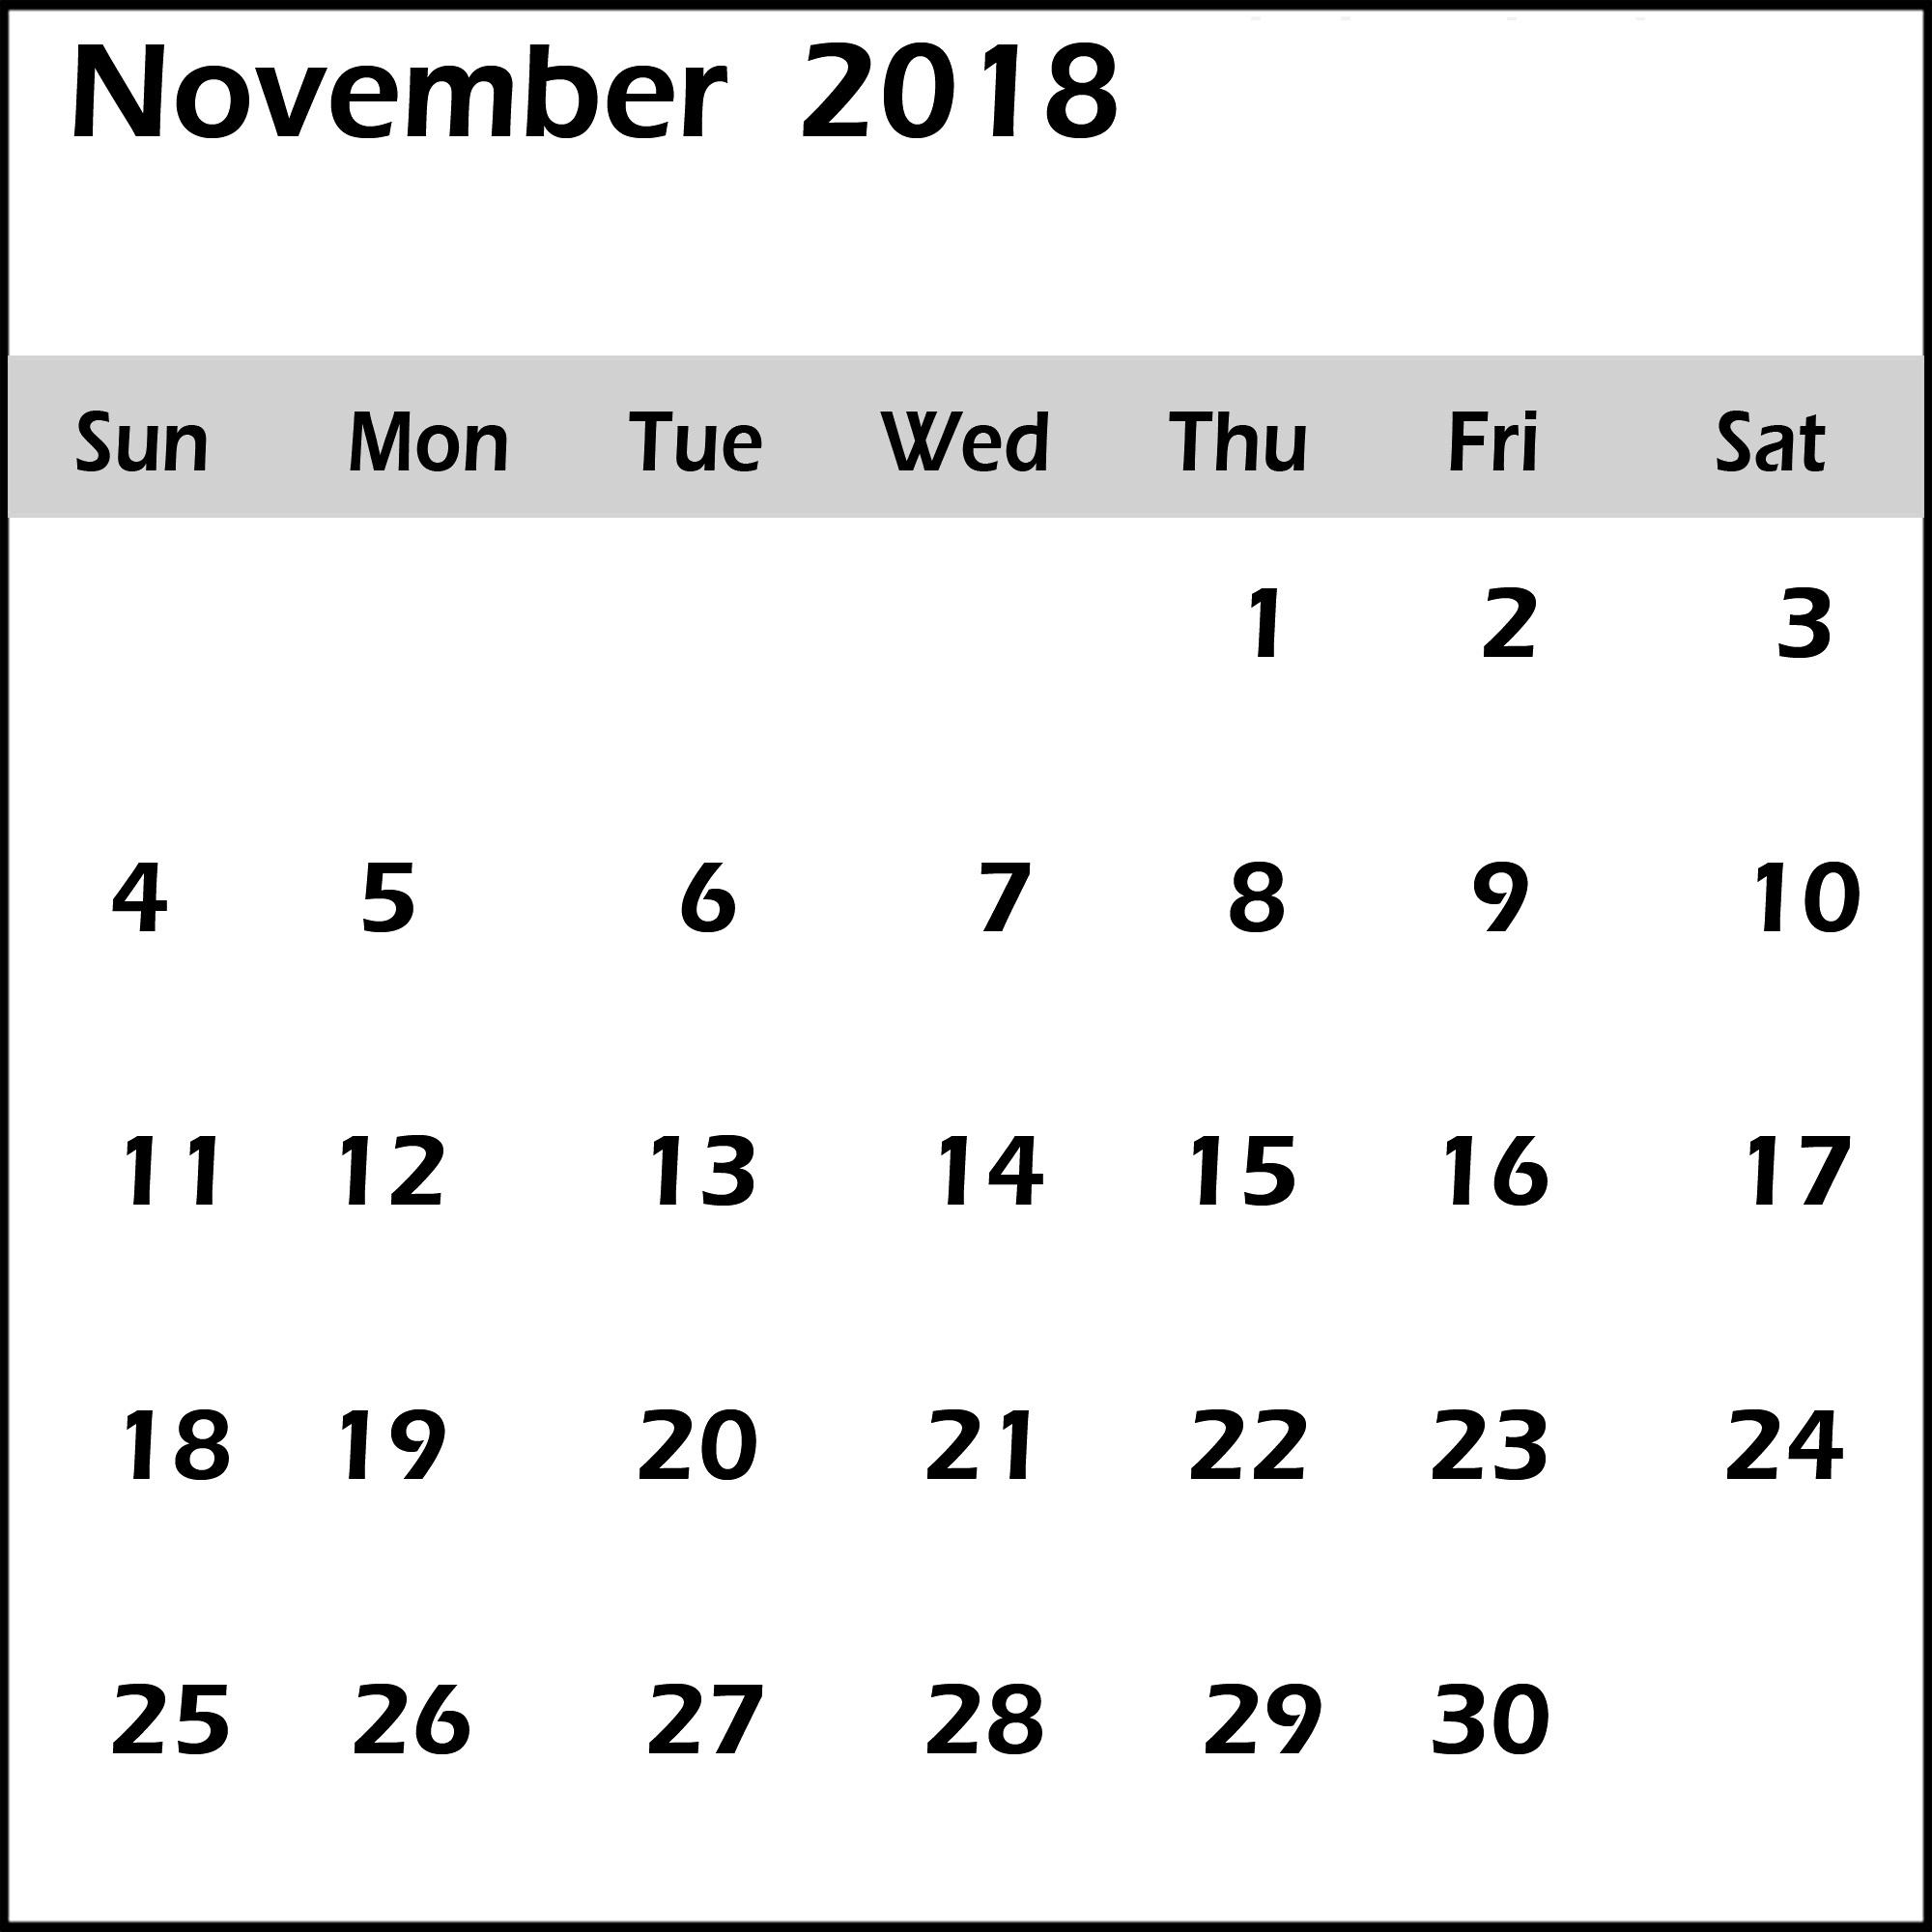 free november 2018 calendar word pdf excel template november::November 2018 Calendar Pdf